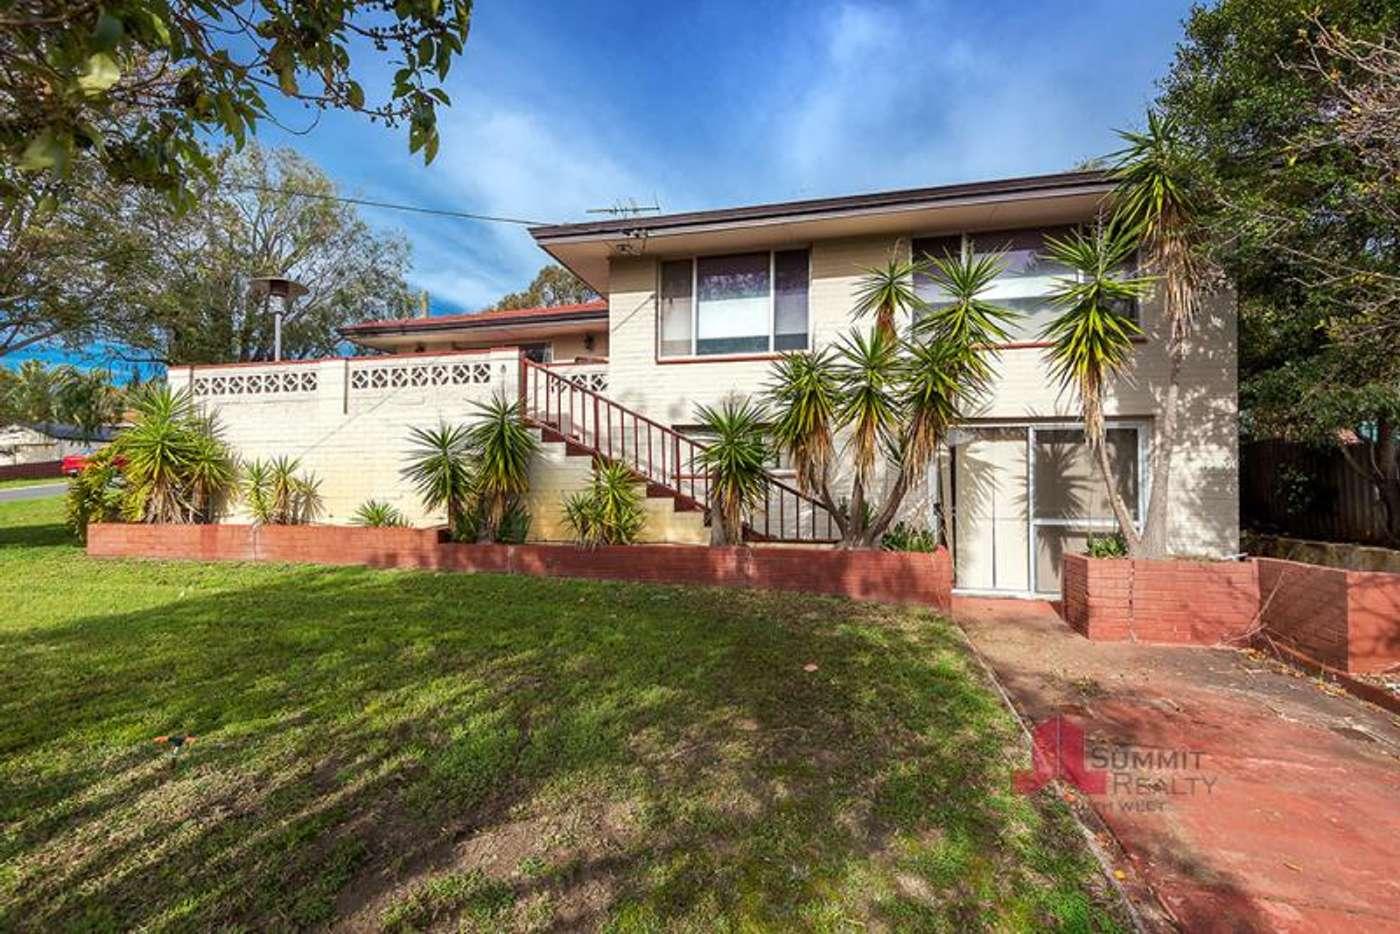 Main view of Homely house listing, 8 Millard Street, Eaton WA 6232